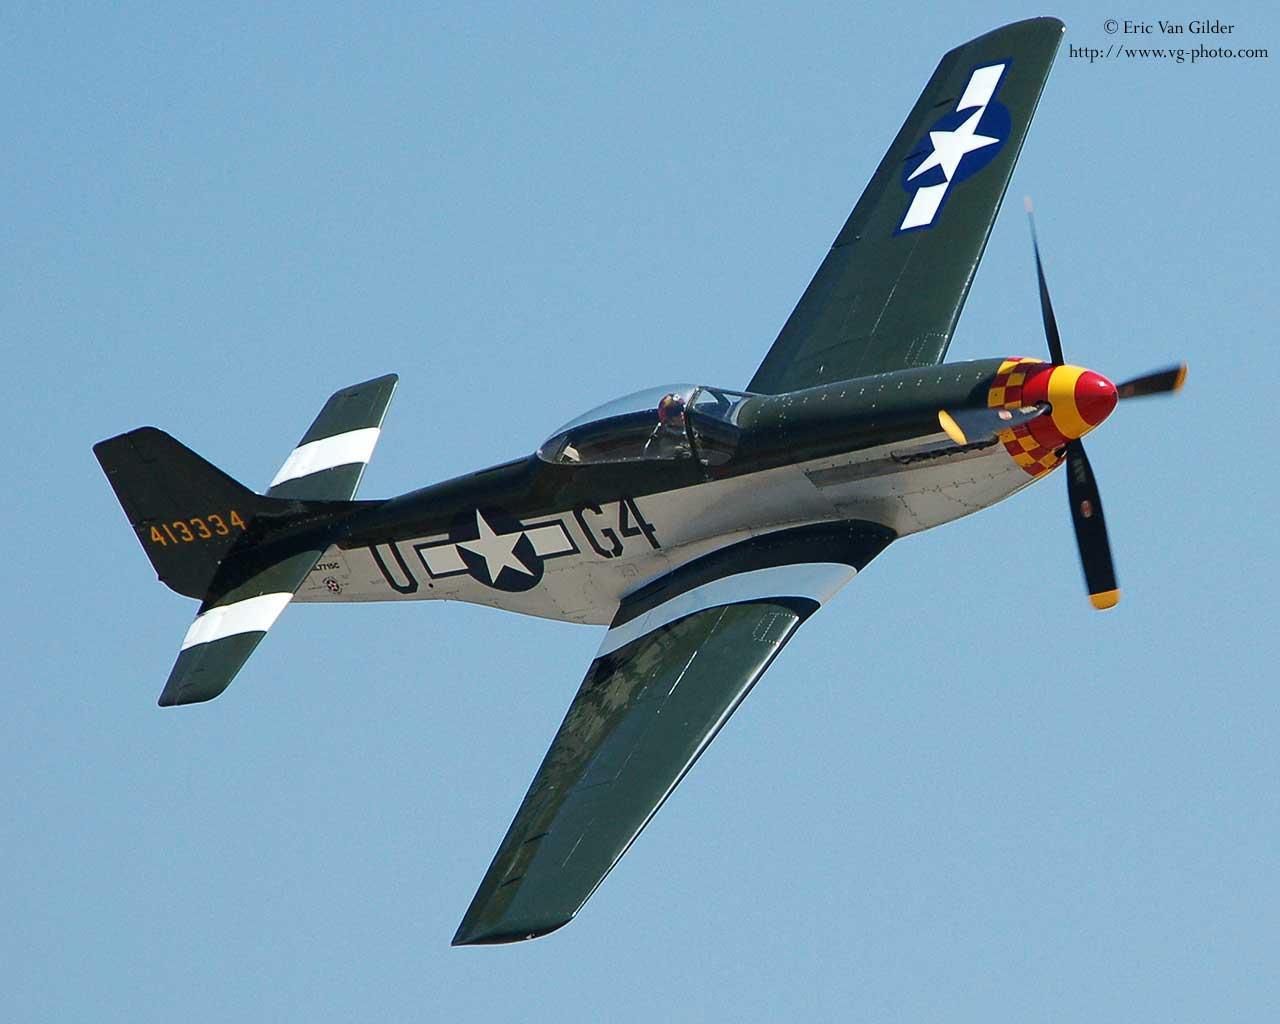 P-51 Mustang Mustang2_DSC_3436